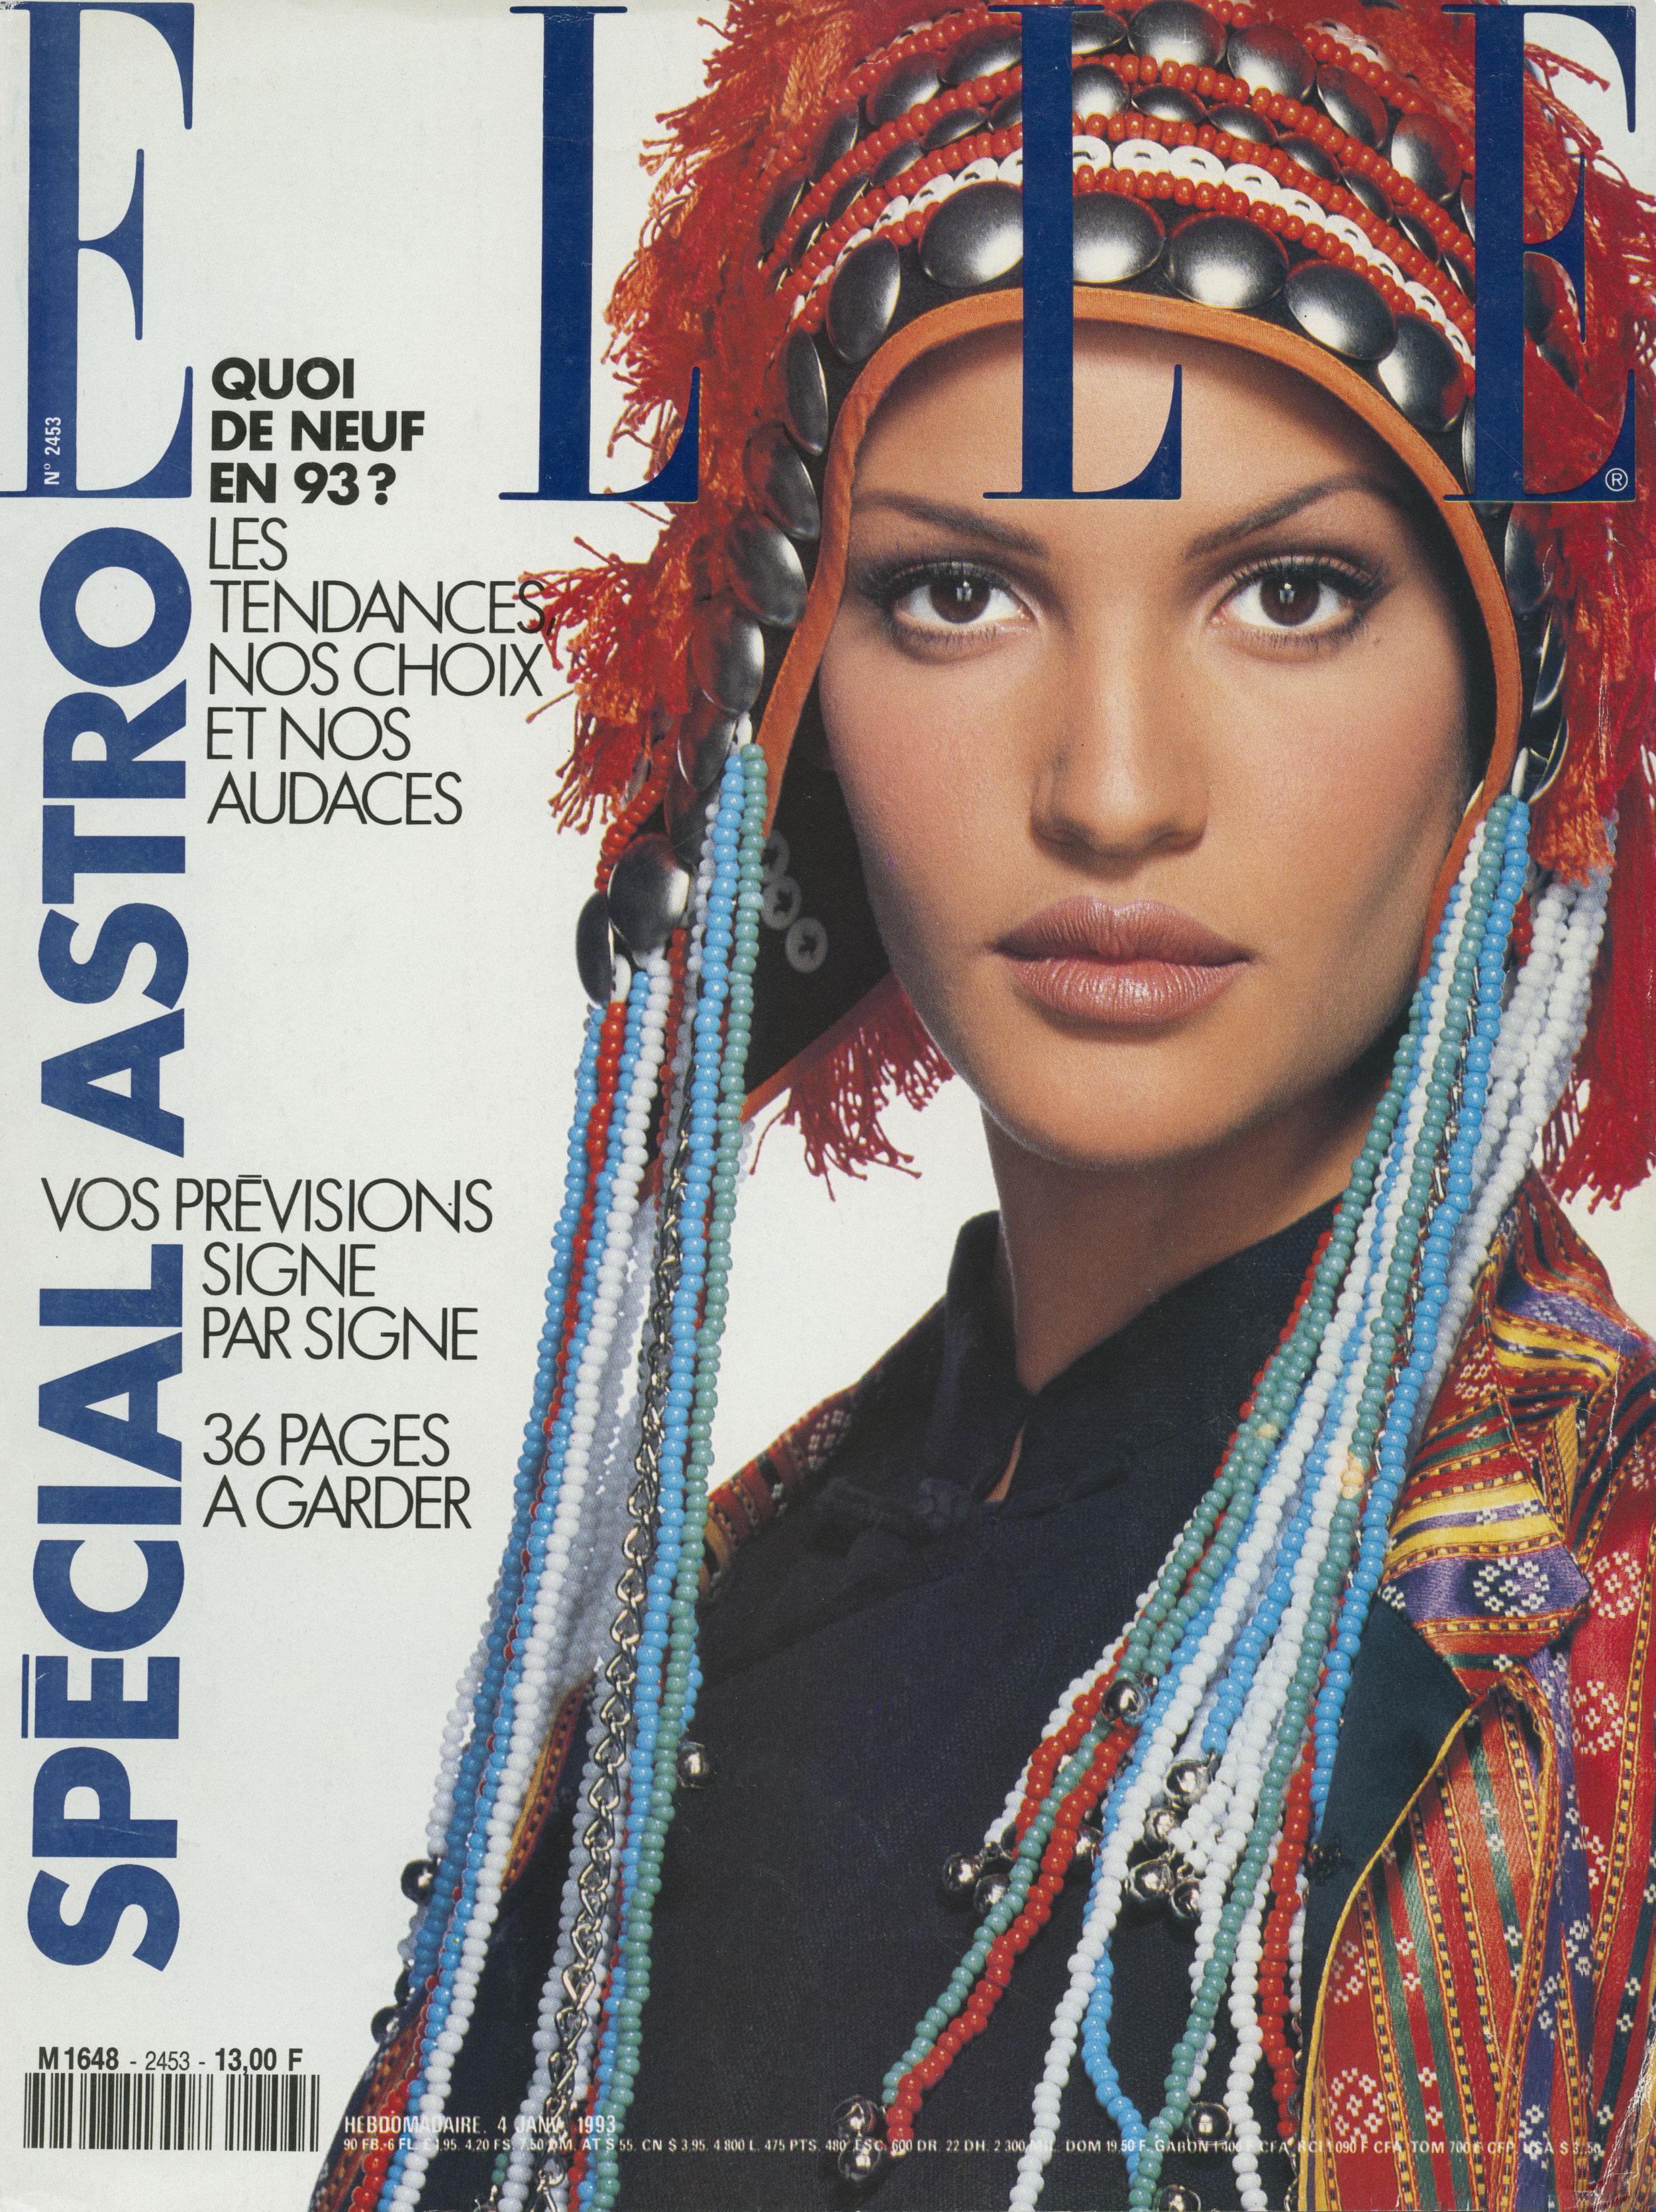 Elle France Cover, Gilles Bensimon